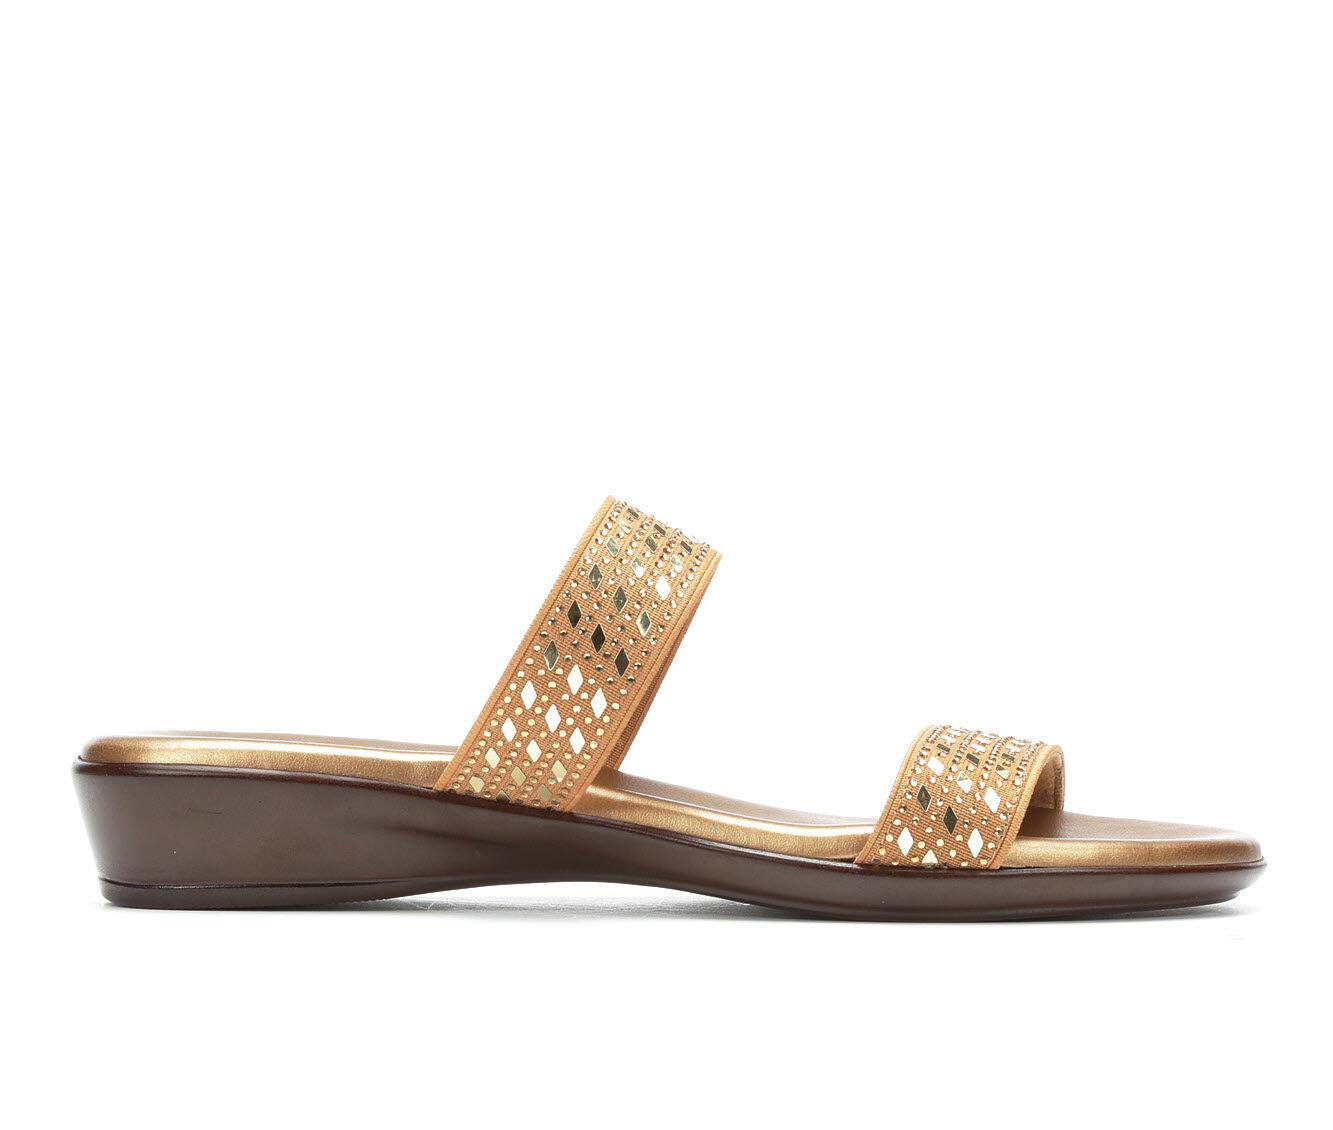 latest style Women's Italian Shoemakers Clay Sandals Bronze